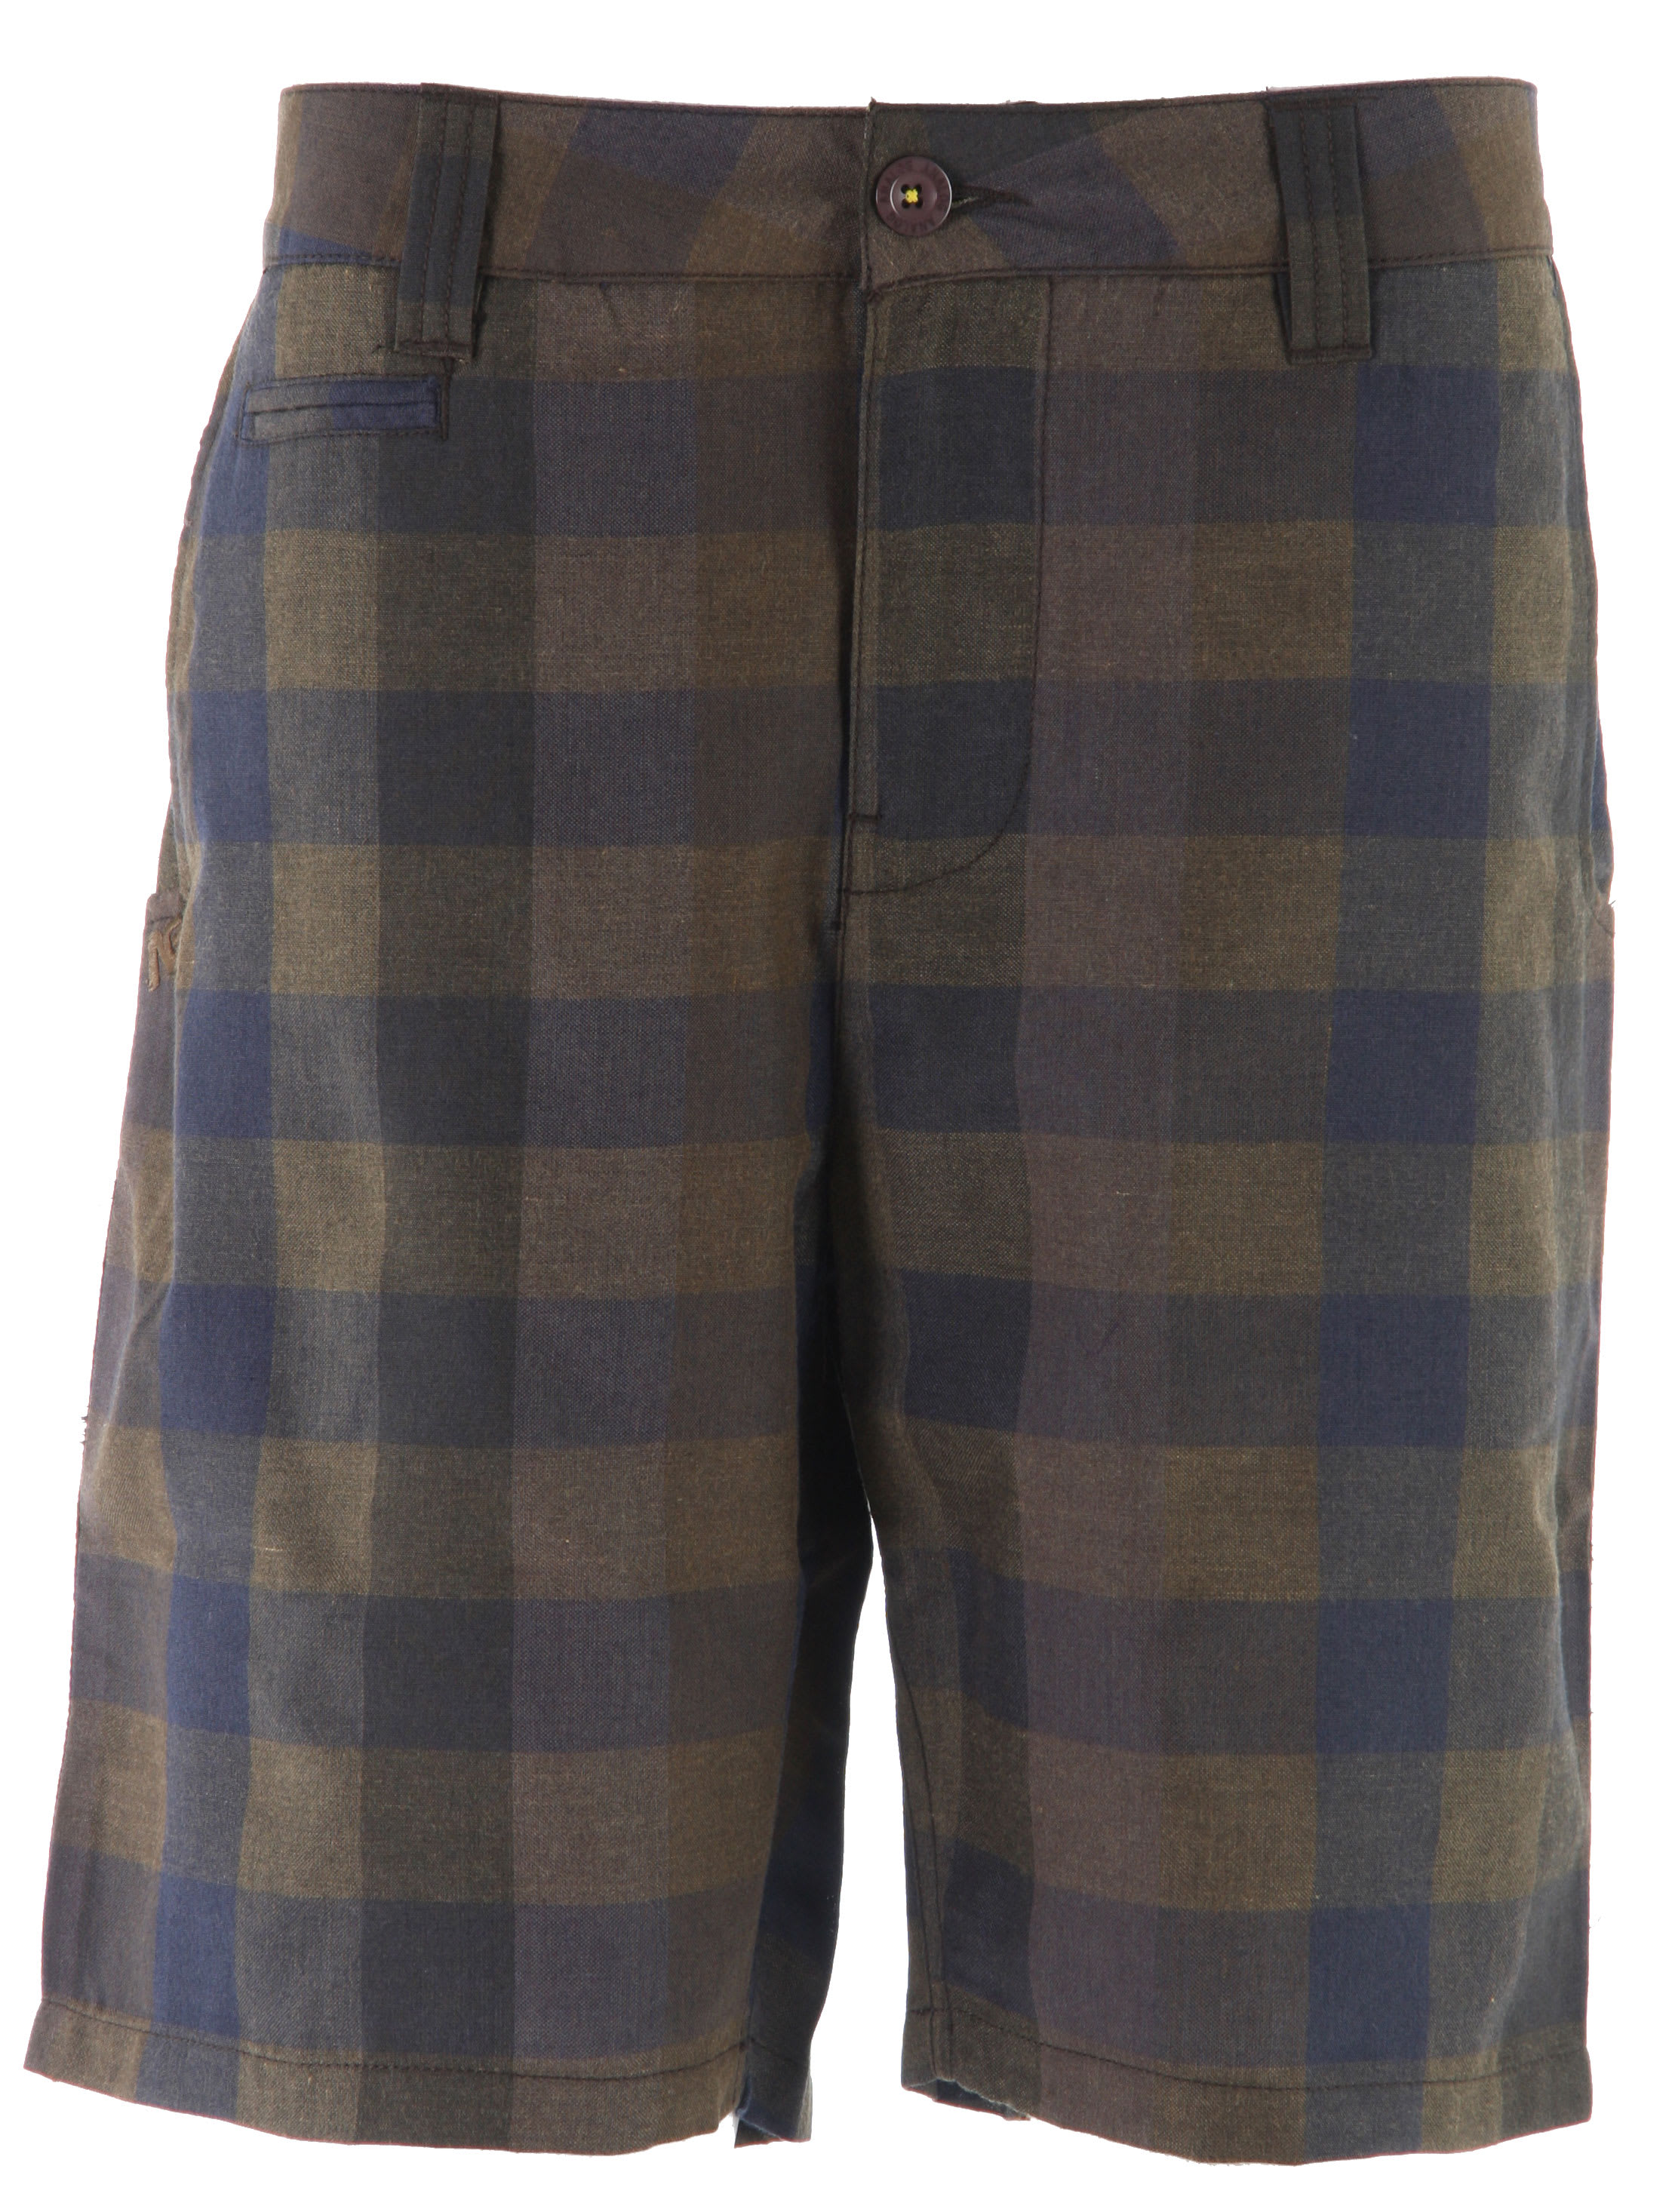 Analog Melrose Shorts